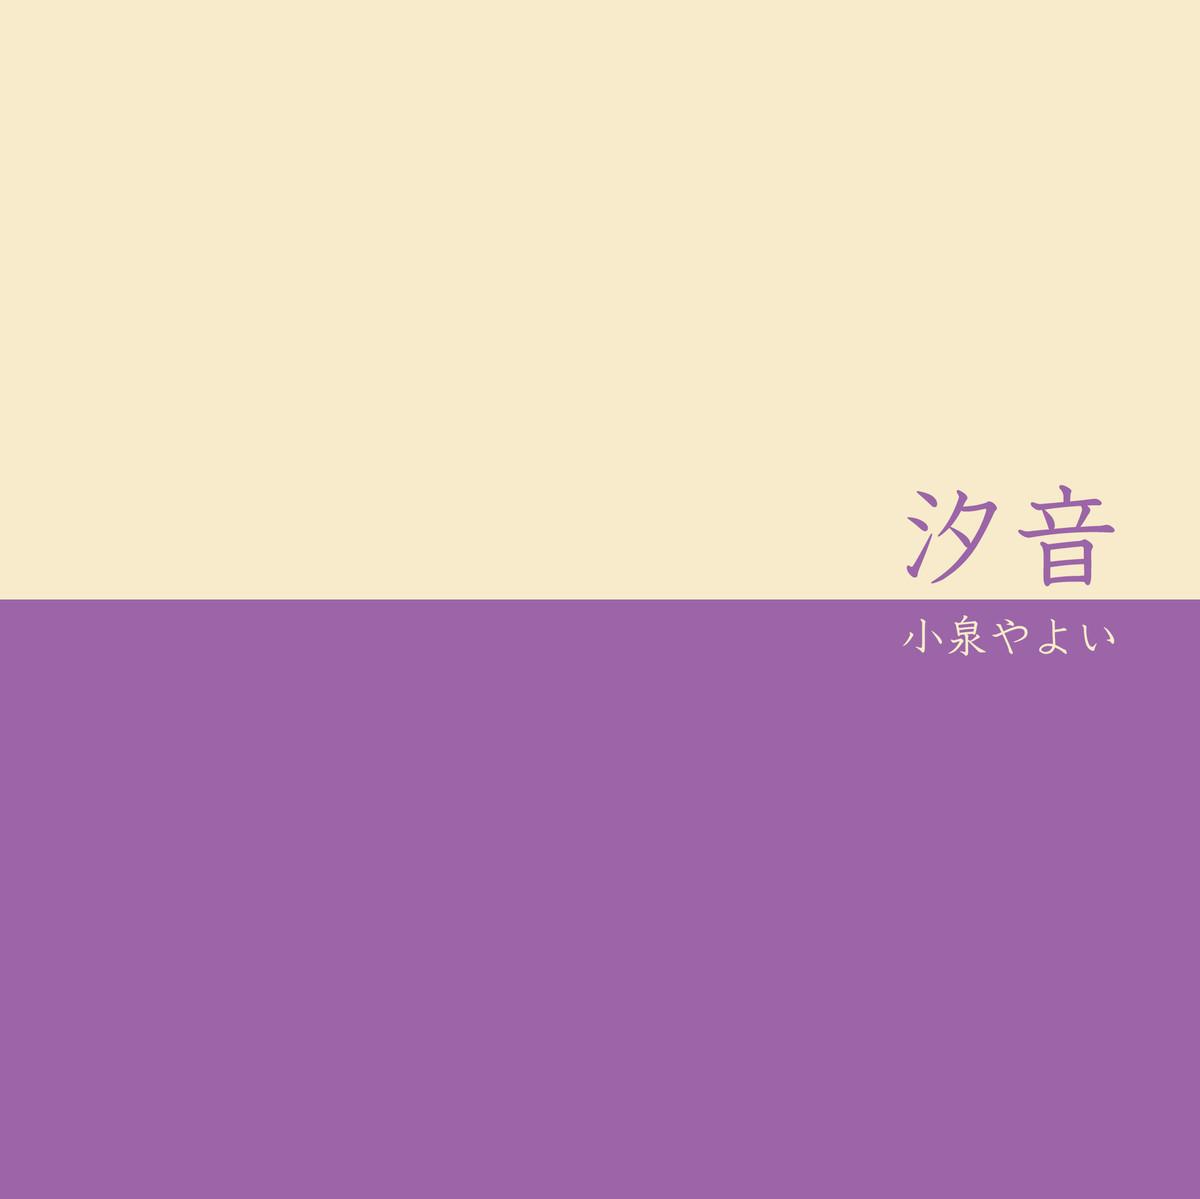 f:id:yayoi-k:20191116101437j:plain